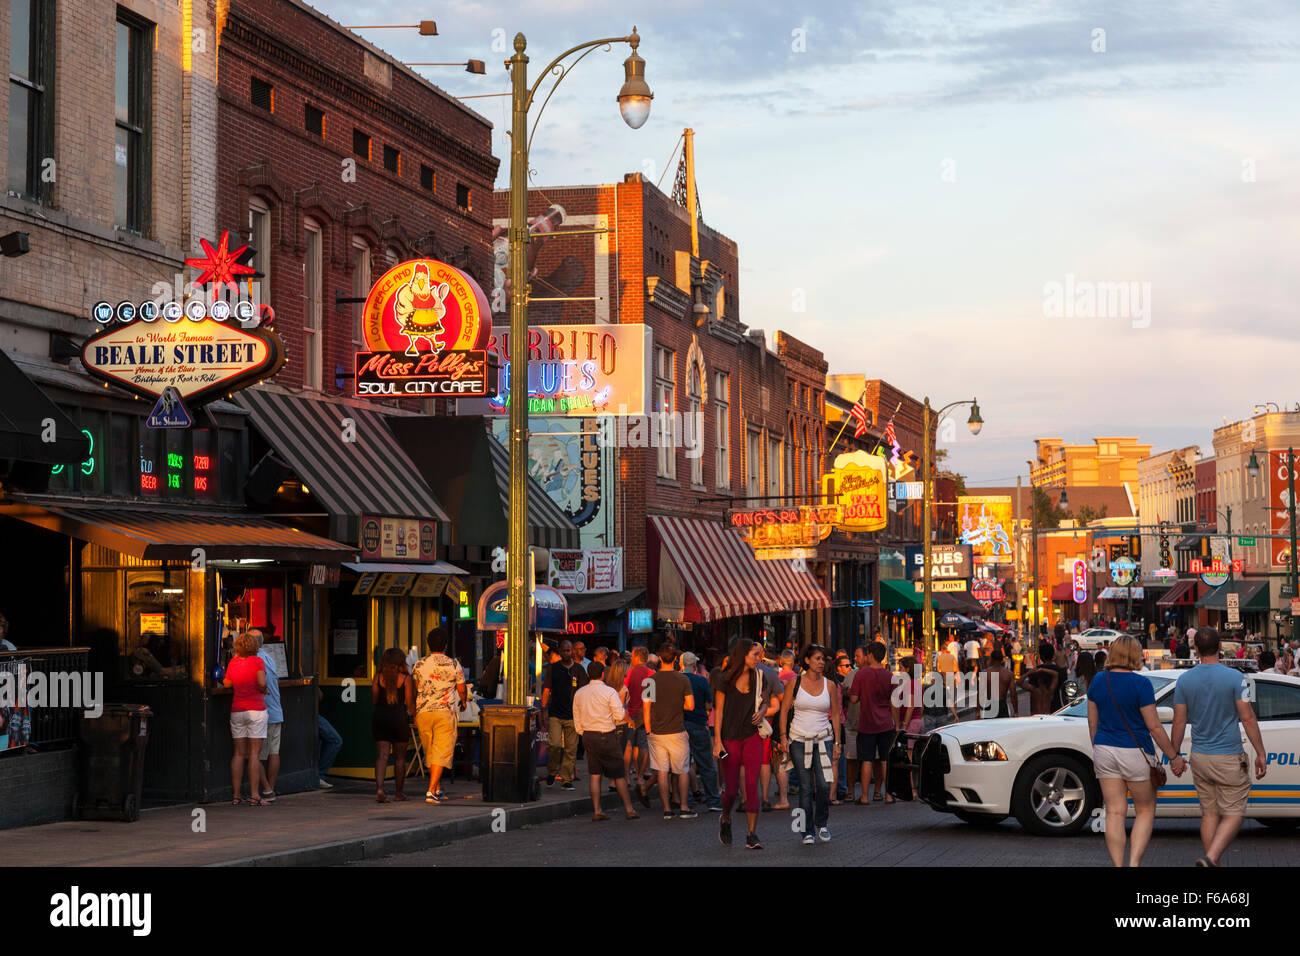 Beale Street, Memphis, Tennessee, USA - Stock Image